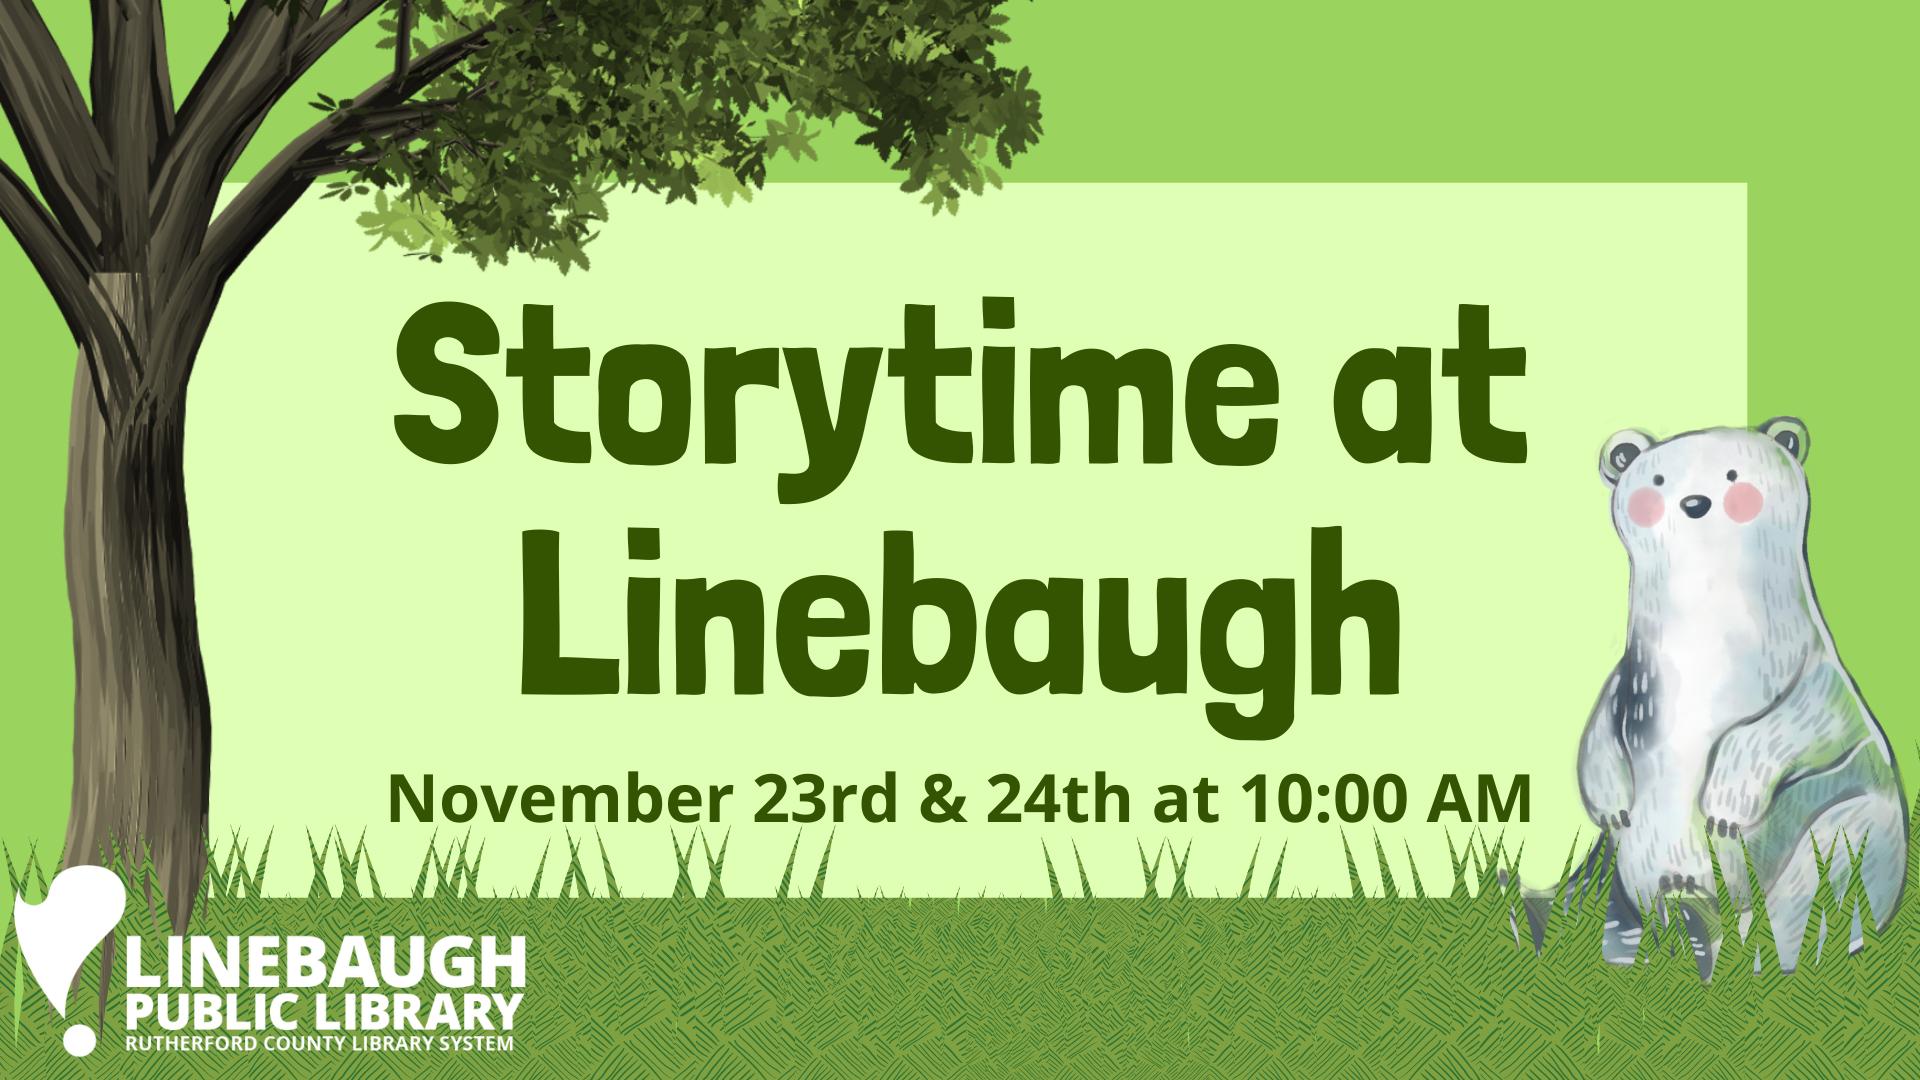 Storytime at Linebaugh